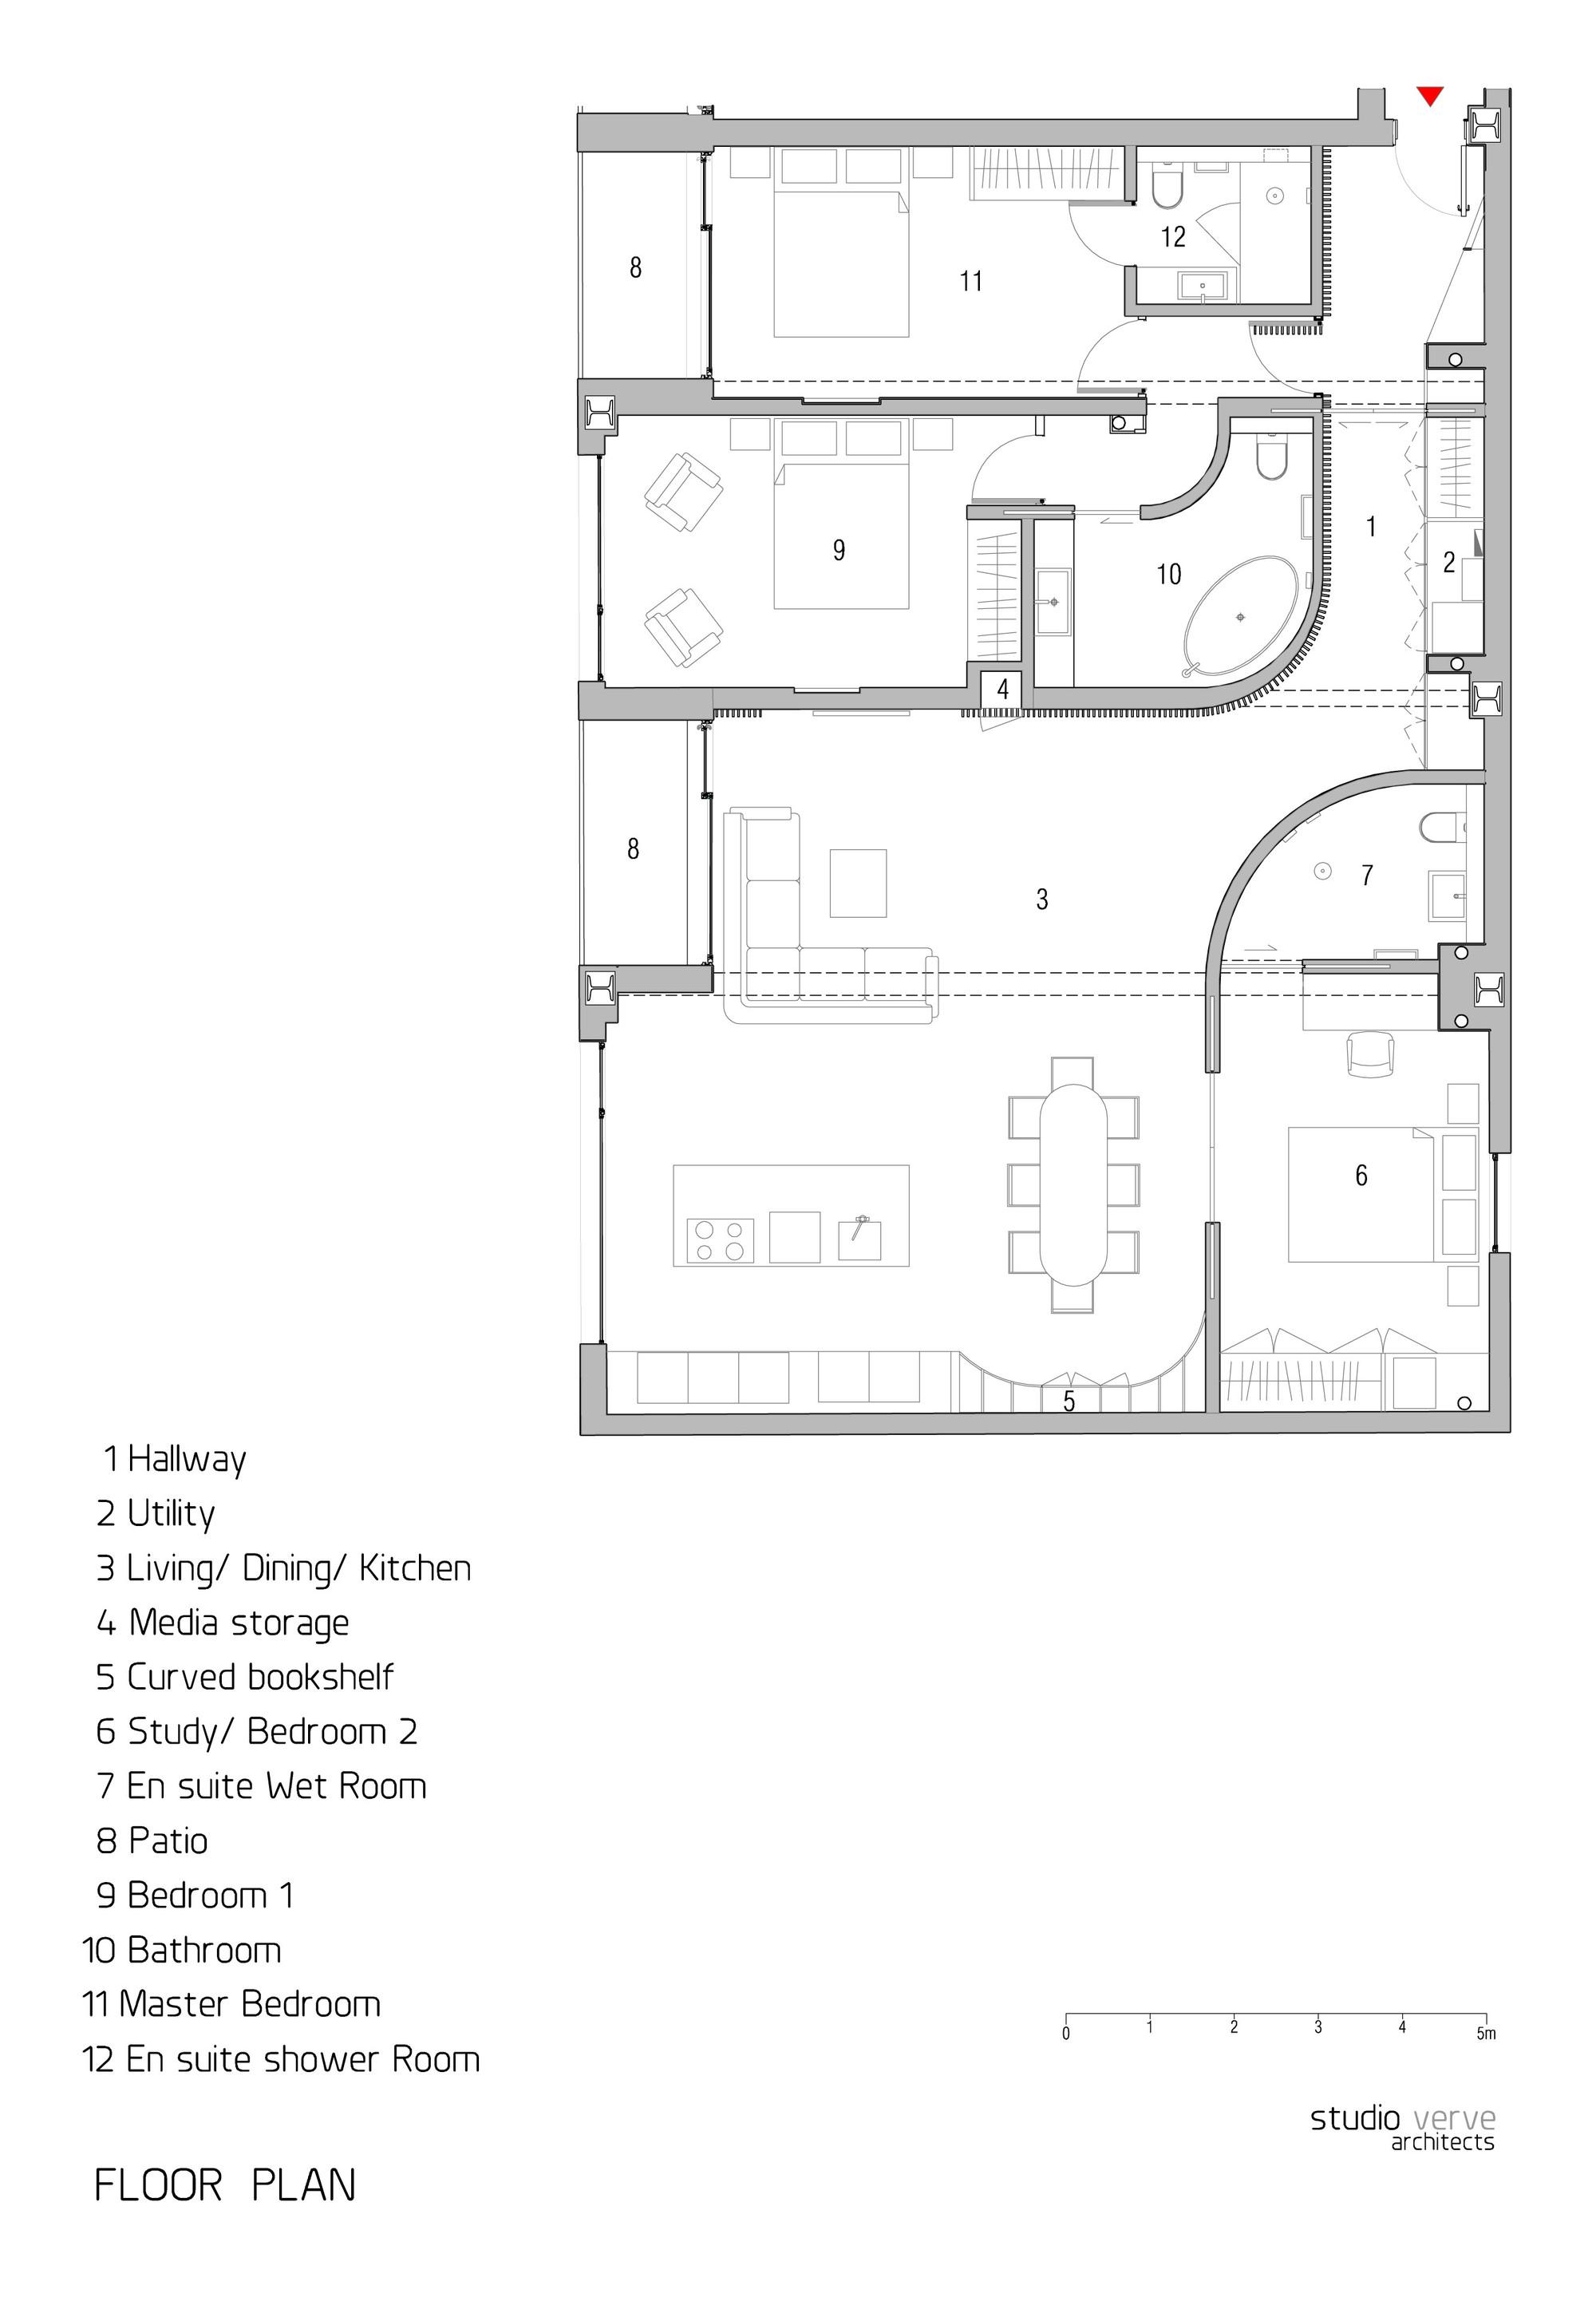 gallery of redchurch loft apartment / studio verve architects - 14